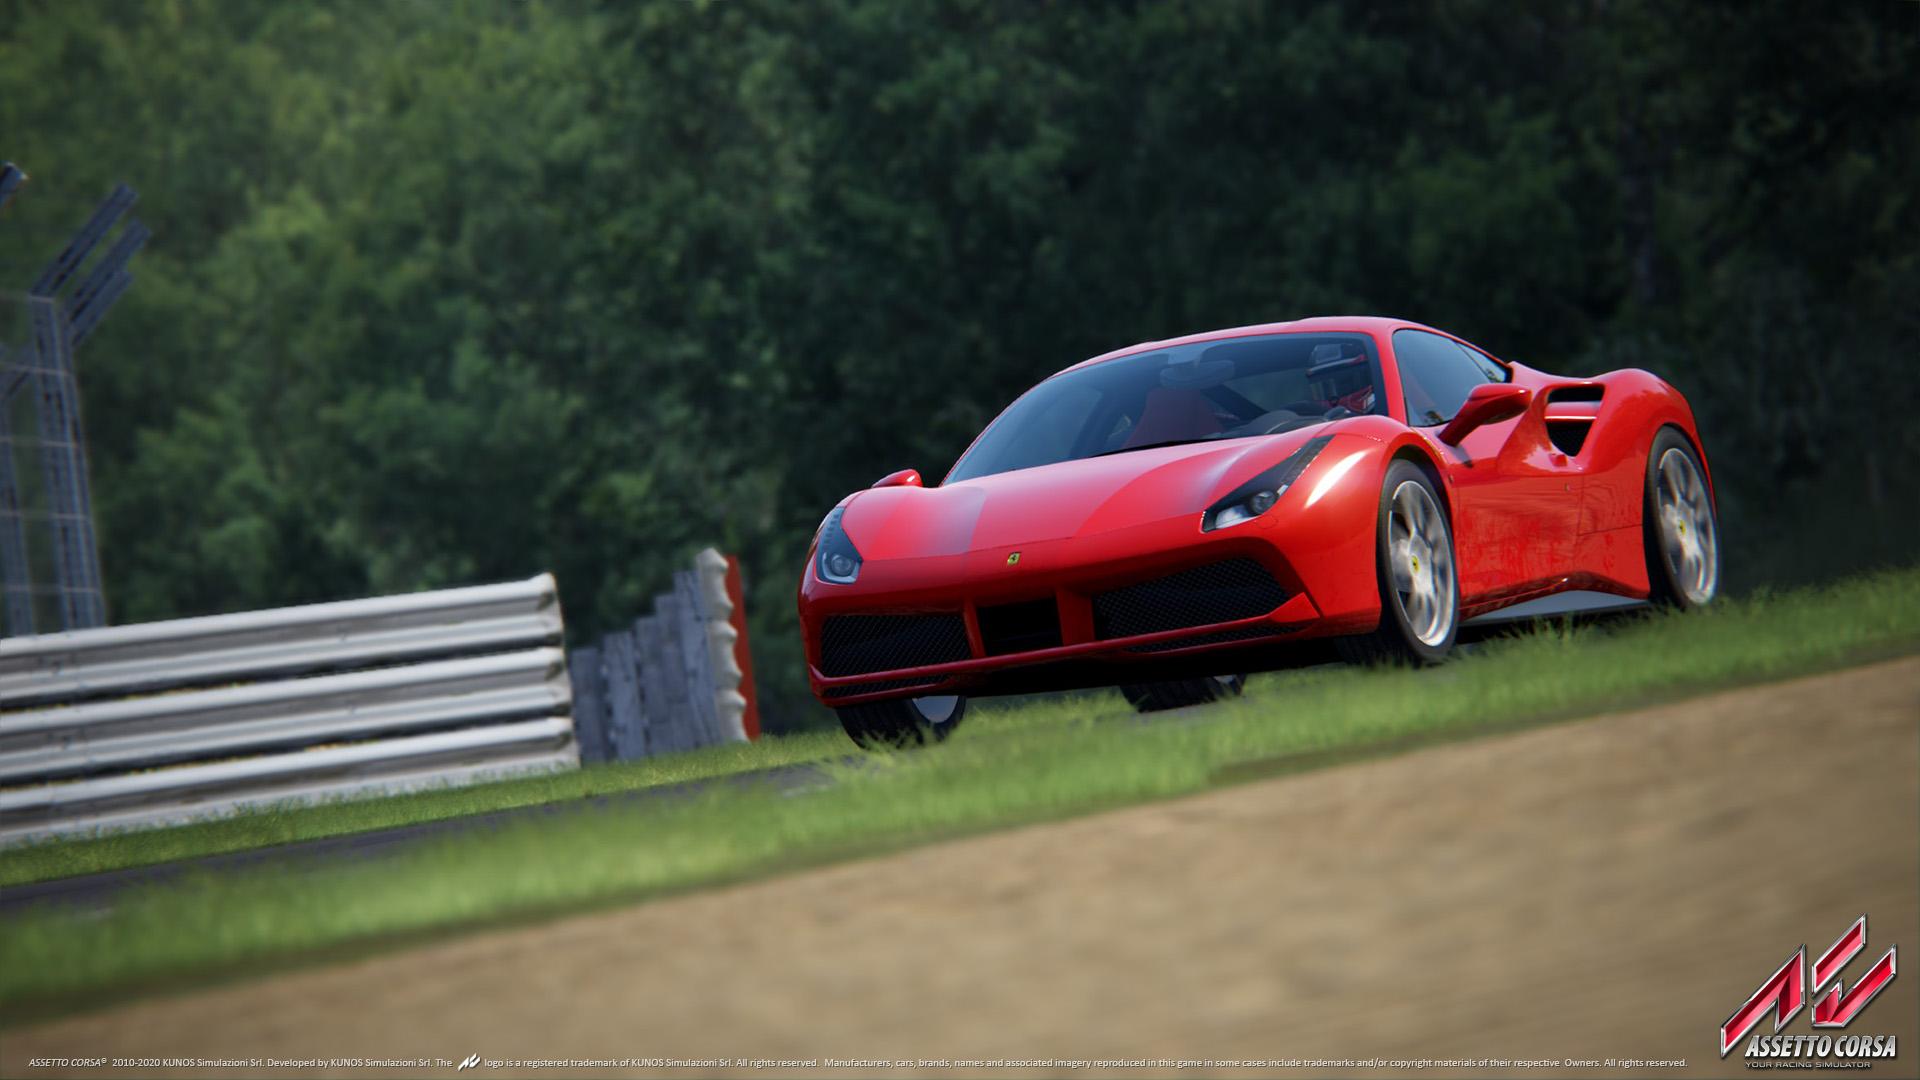 Assetto-Corsa-Tripl3-Pack-Ferrari-488-GTB-01.jpg